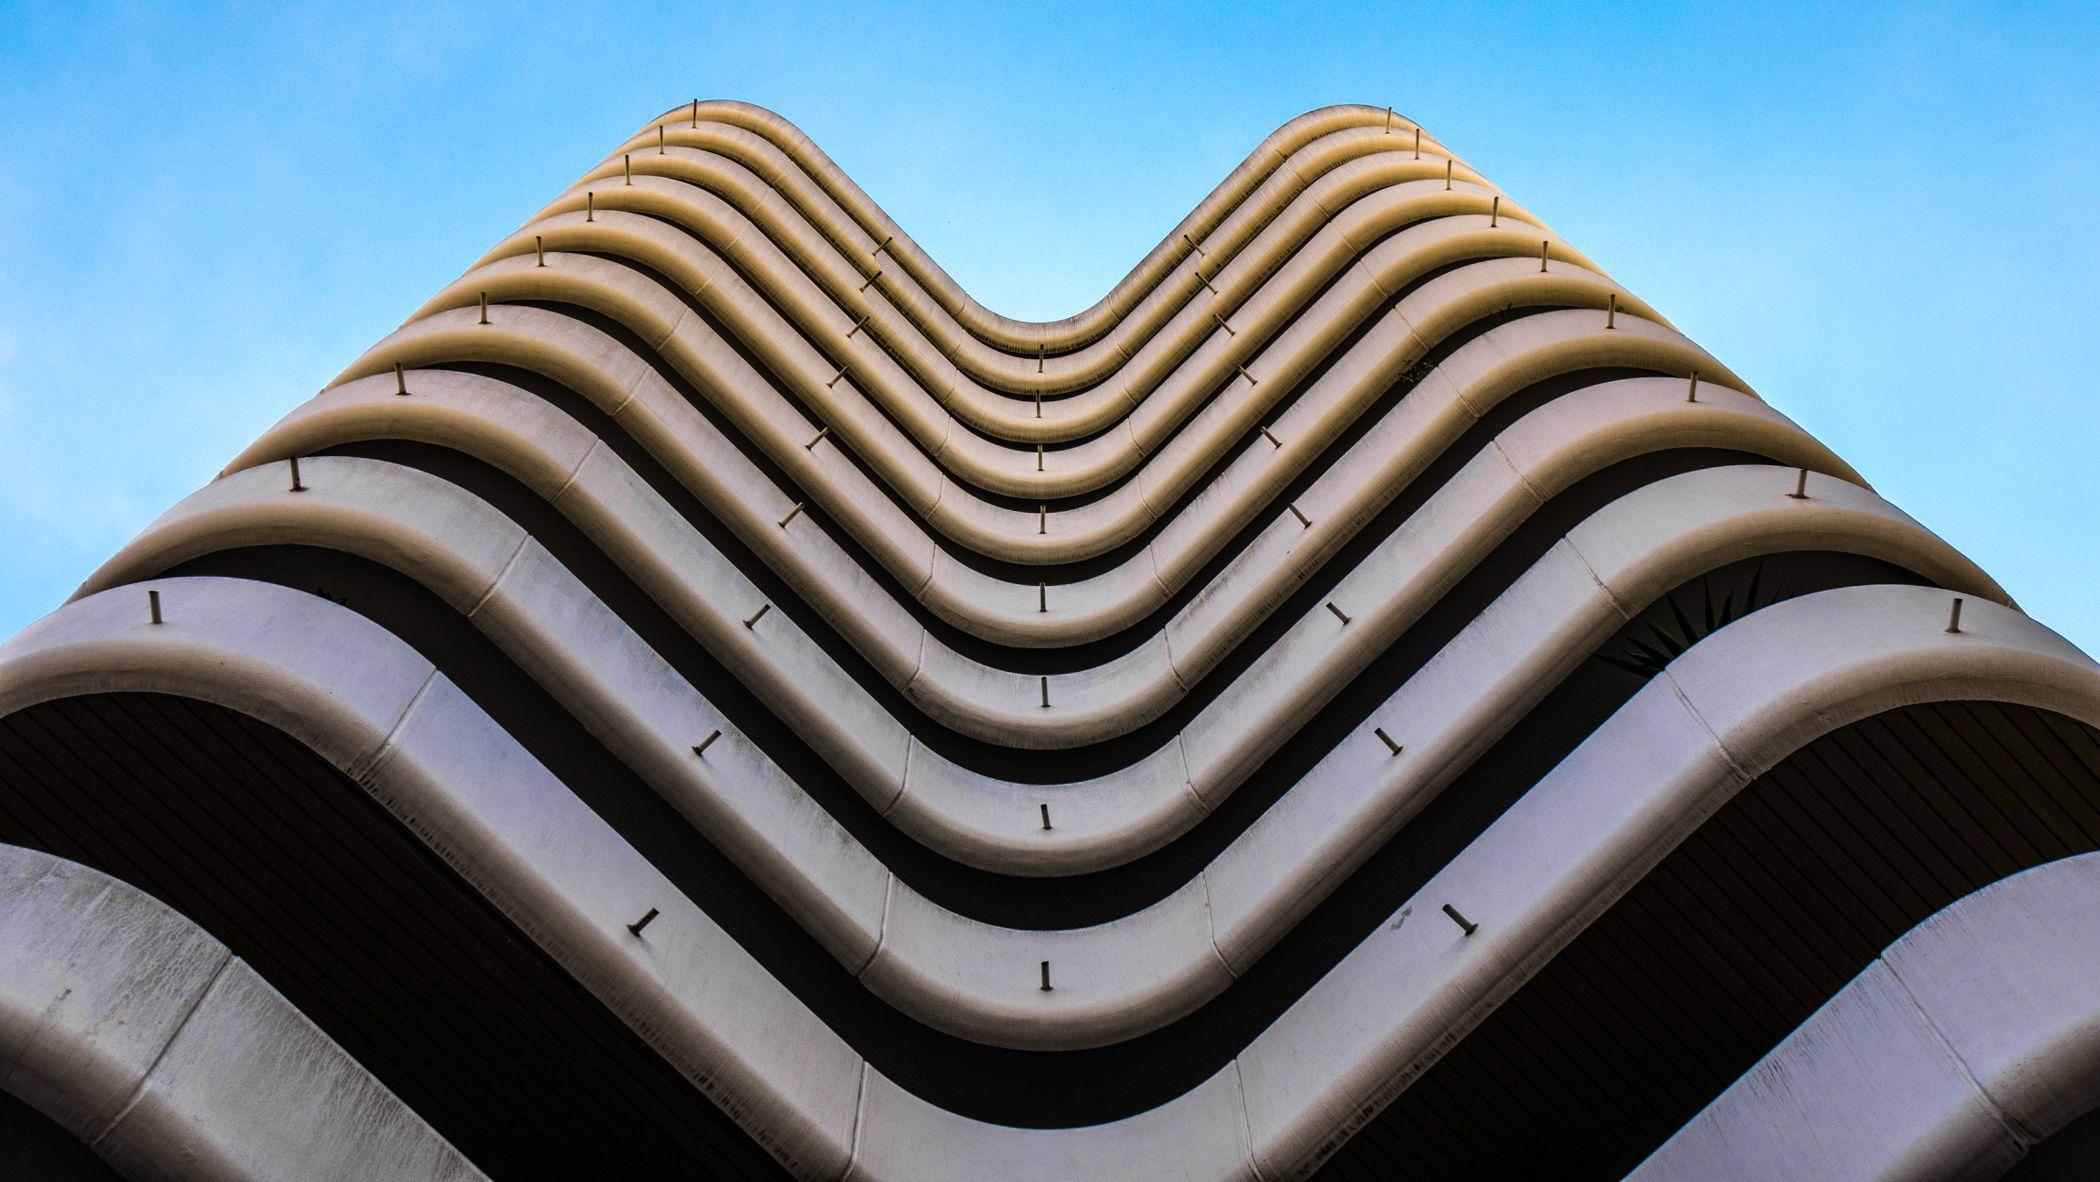 Building, Sky, Rectangle